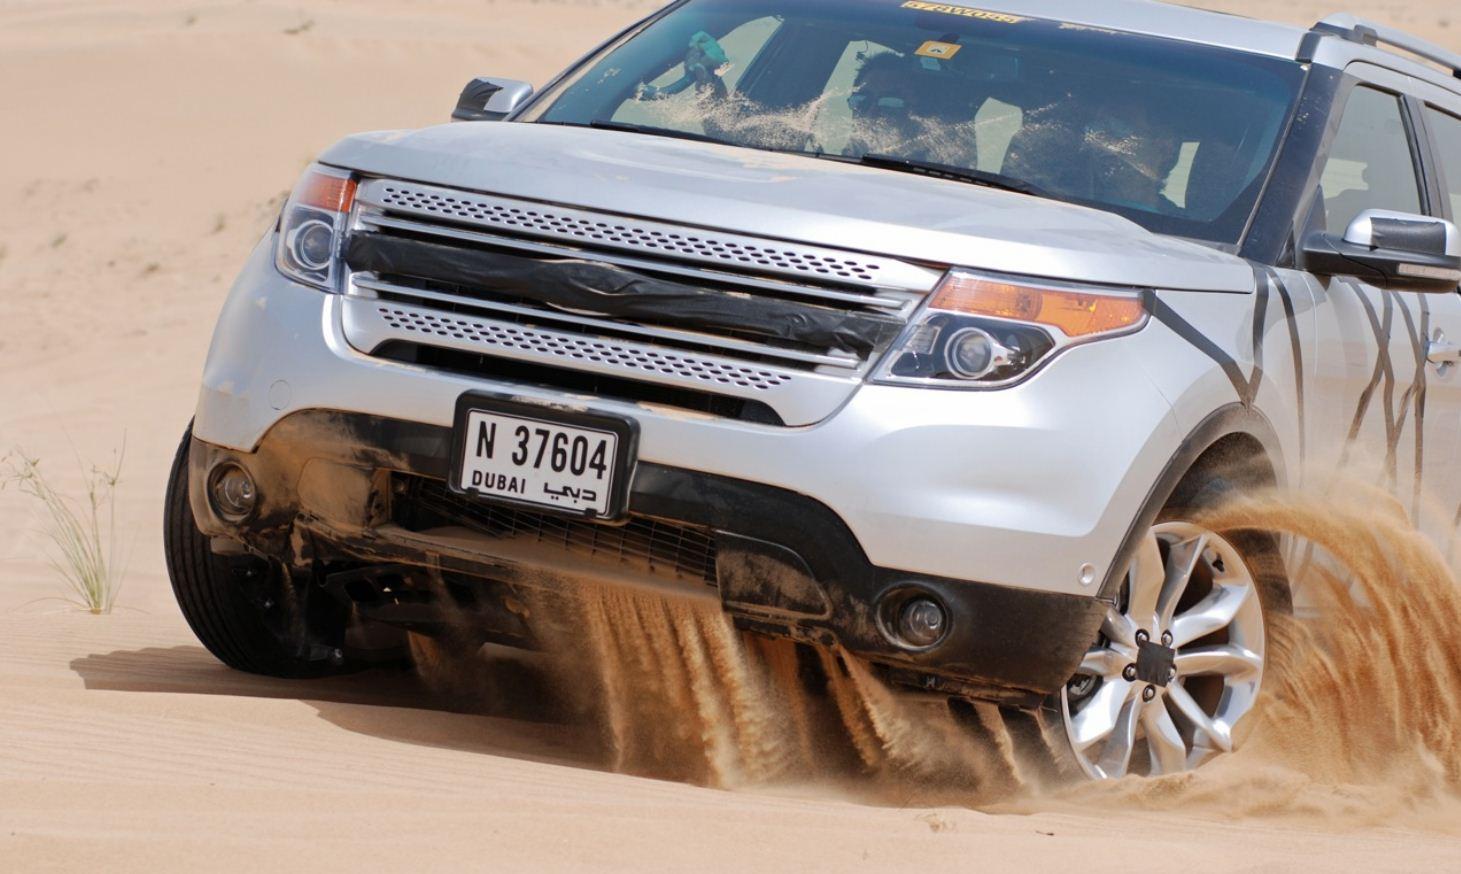 http://4.bp.blogspot.com/_pXnW36GSjVA/TGrXcnTFykI/AAAAAAAACKY/KIiKxeLBSWw/s1600/2011+Ford+Explorer.JPG